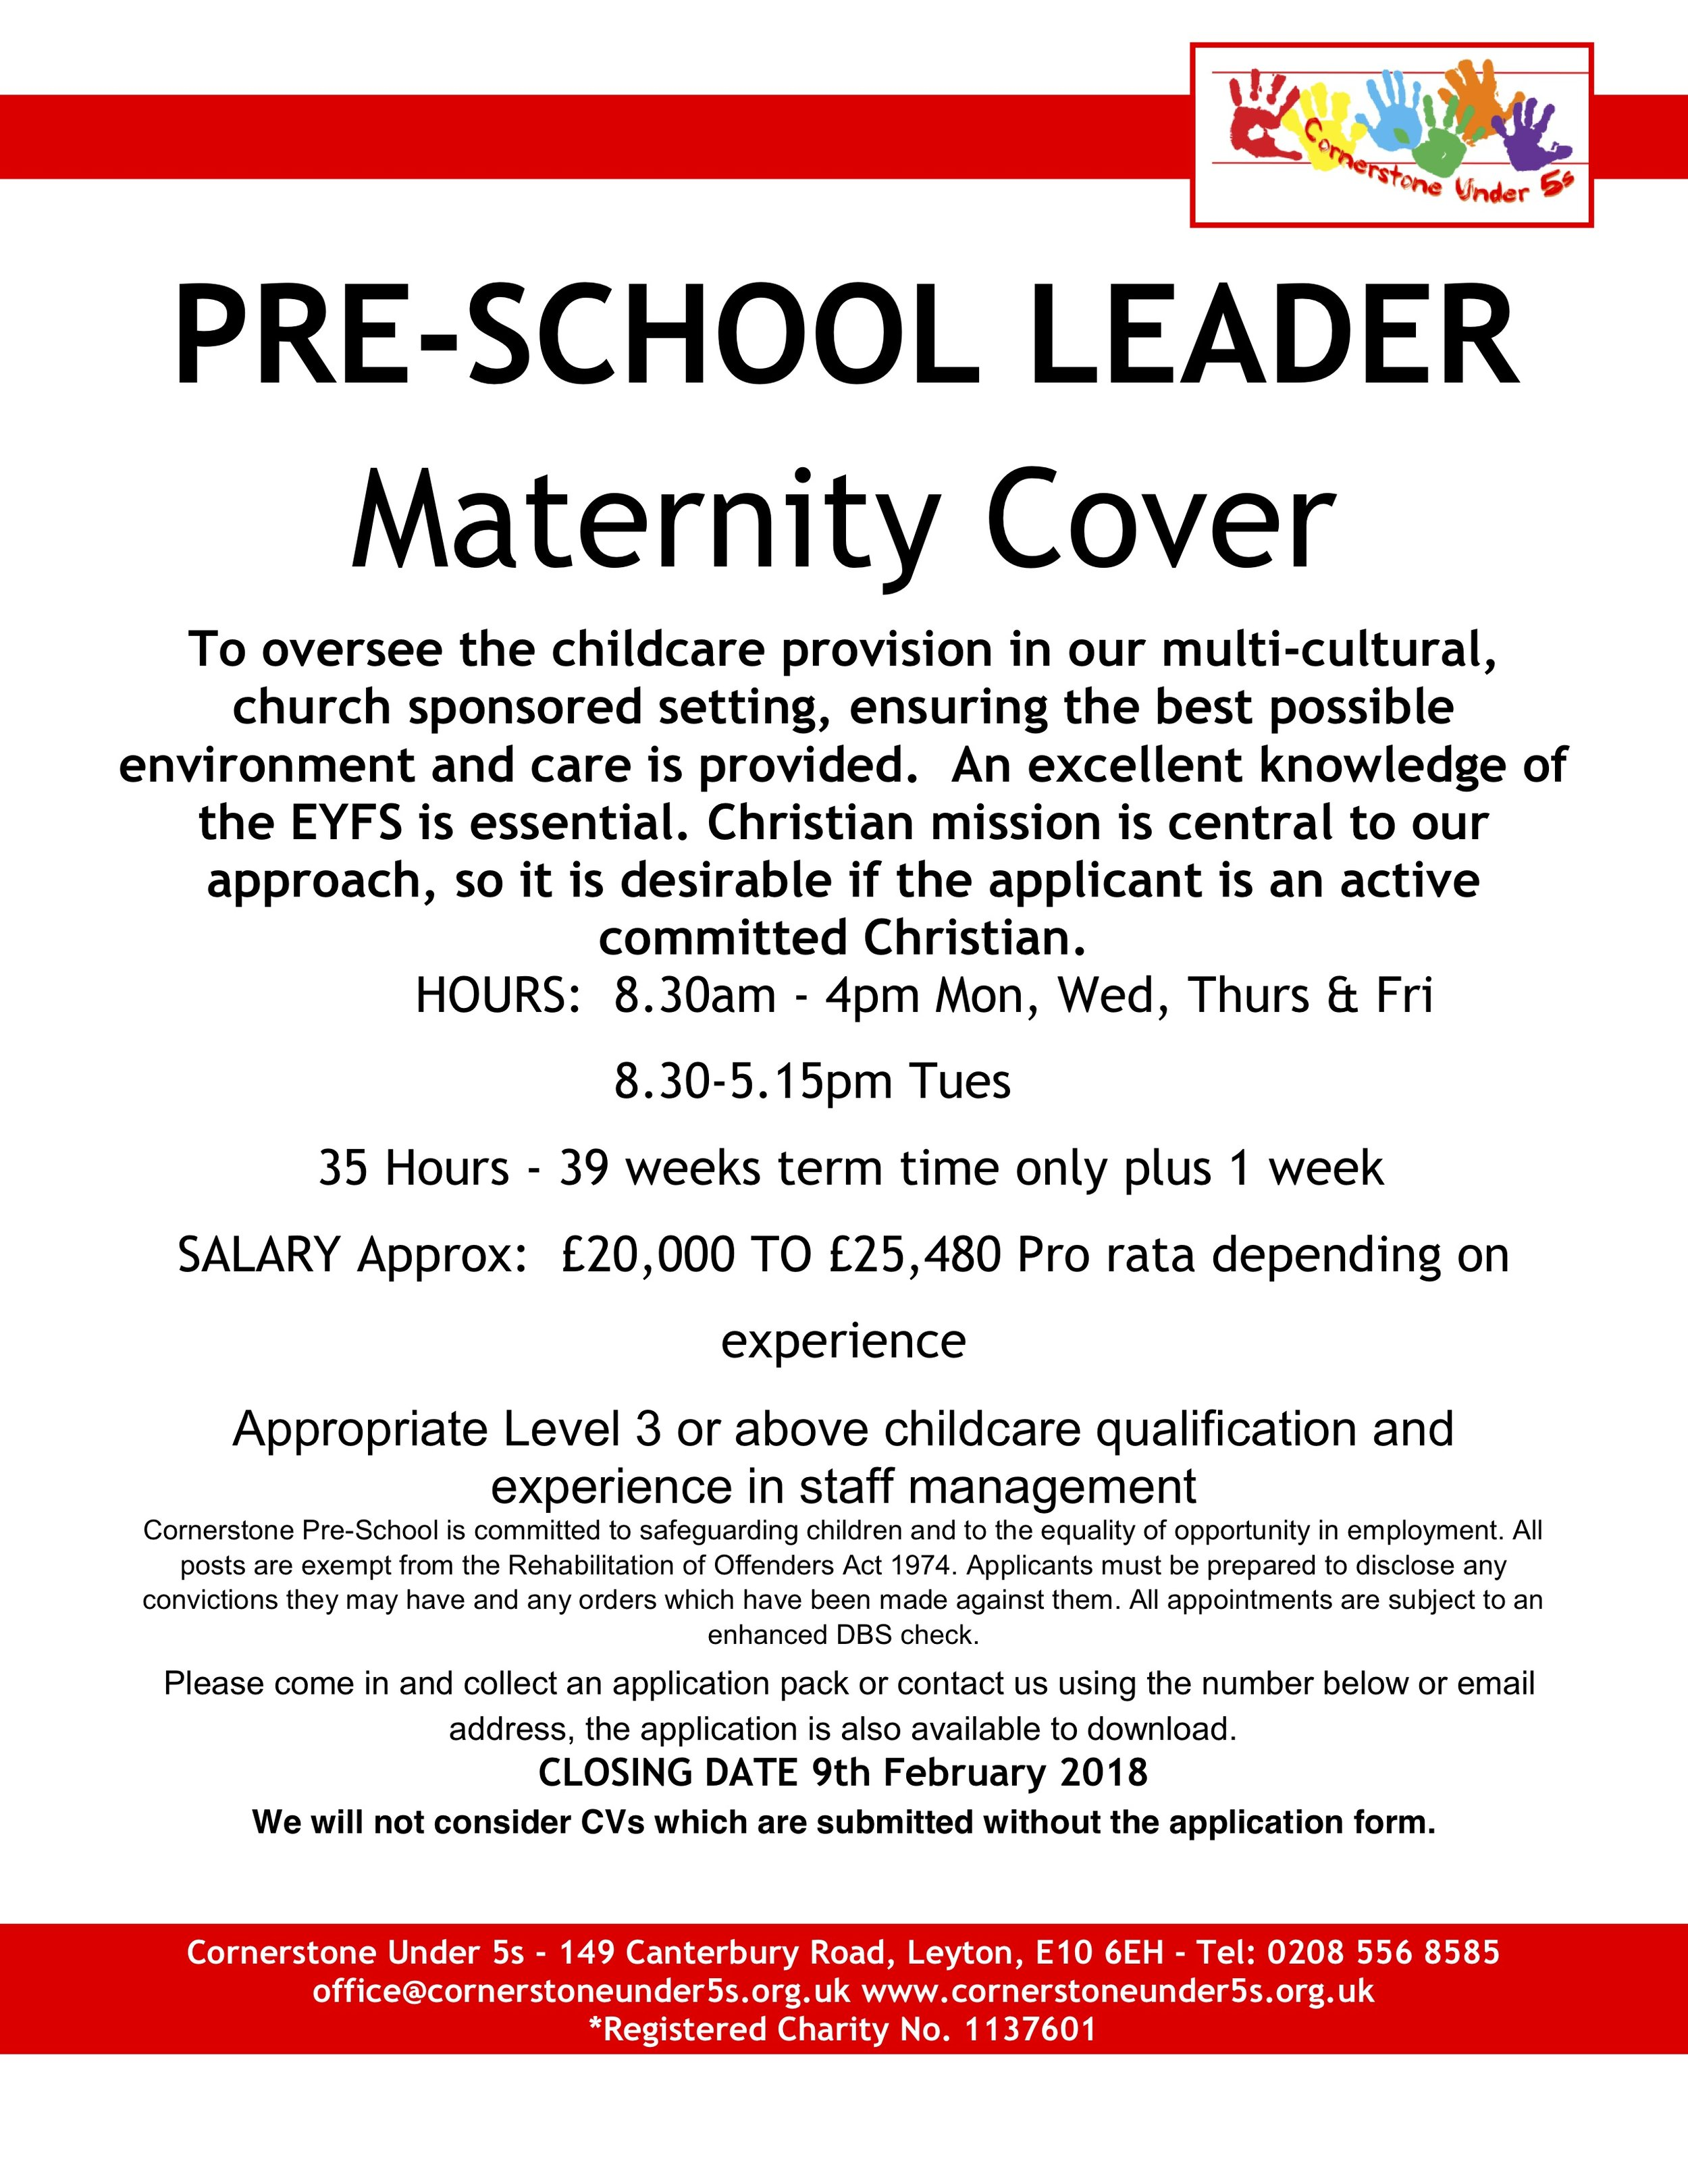 Maternity cover job vacancy 9.1.18.jpg